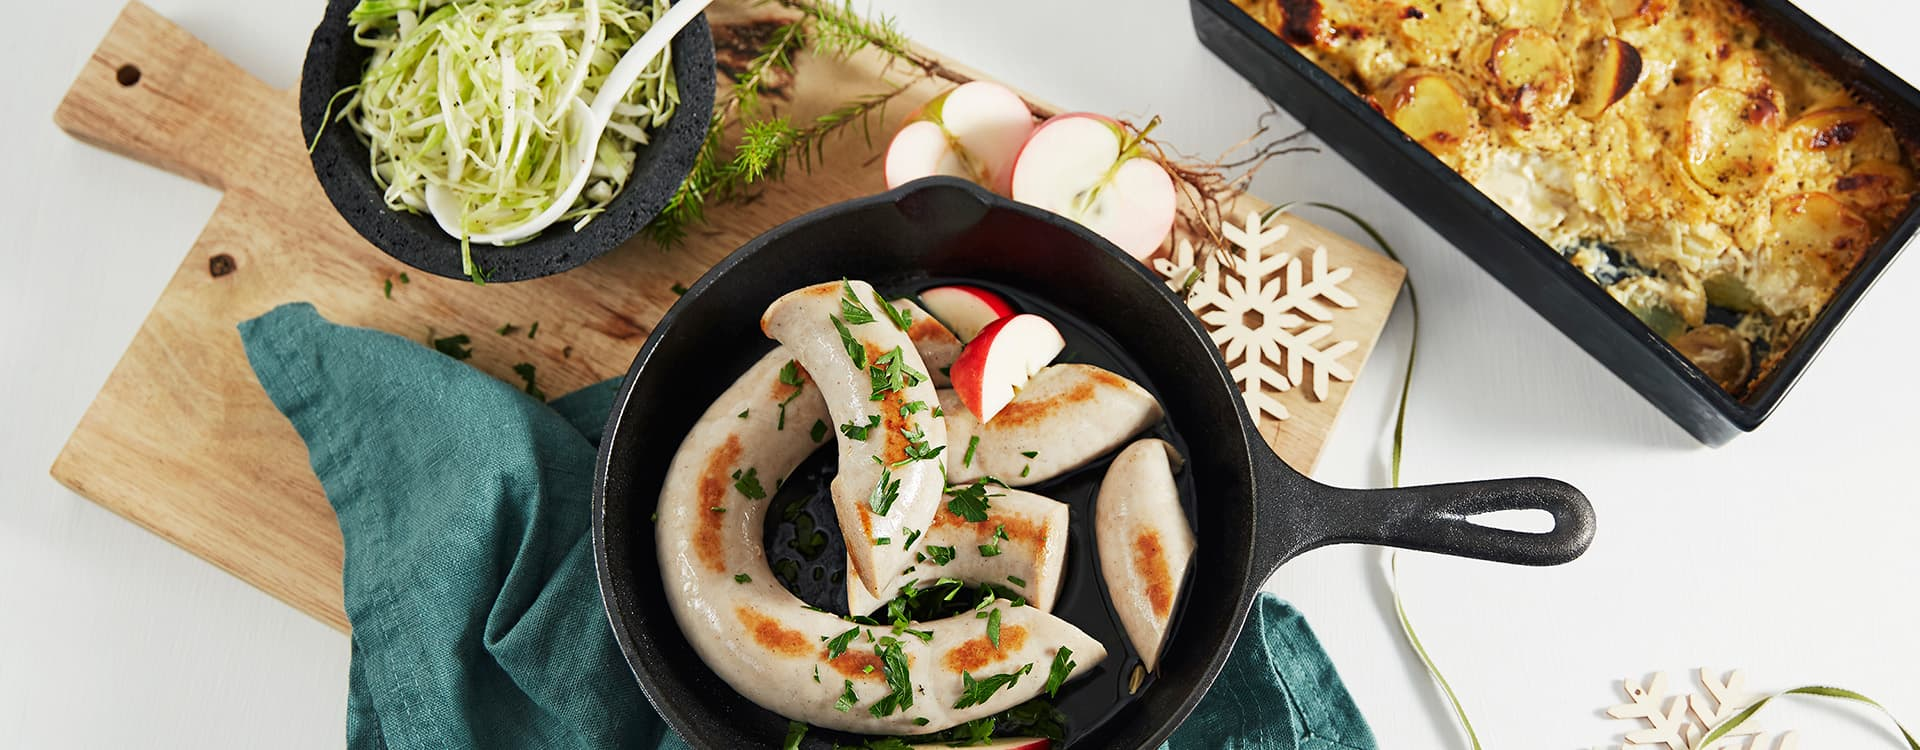 Grov julepølse med potetgrateng og syrlig kålsalat